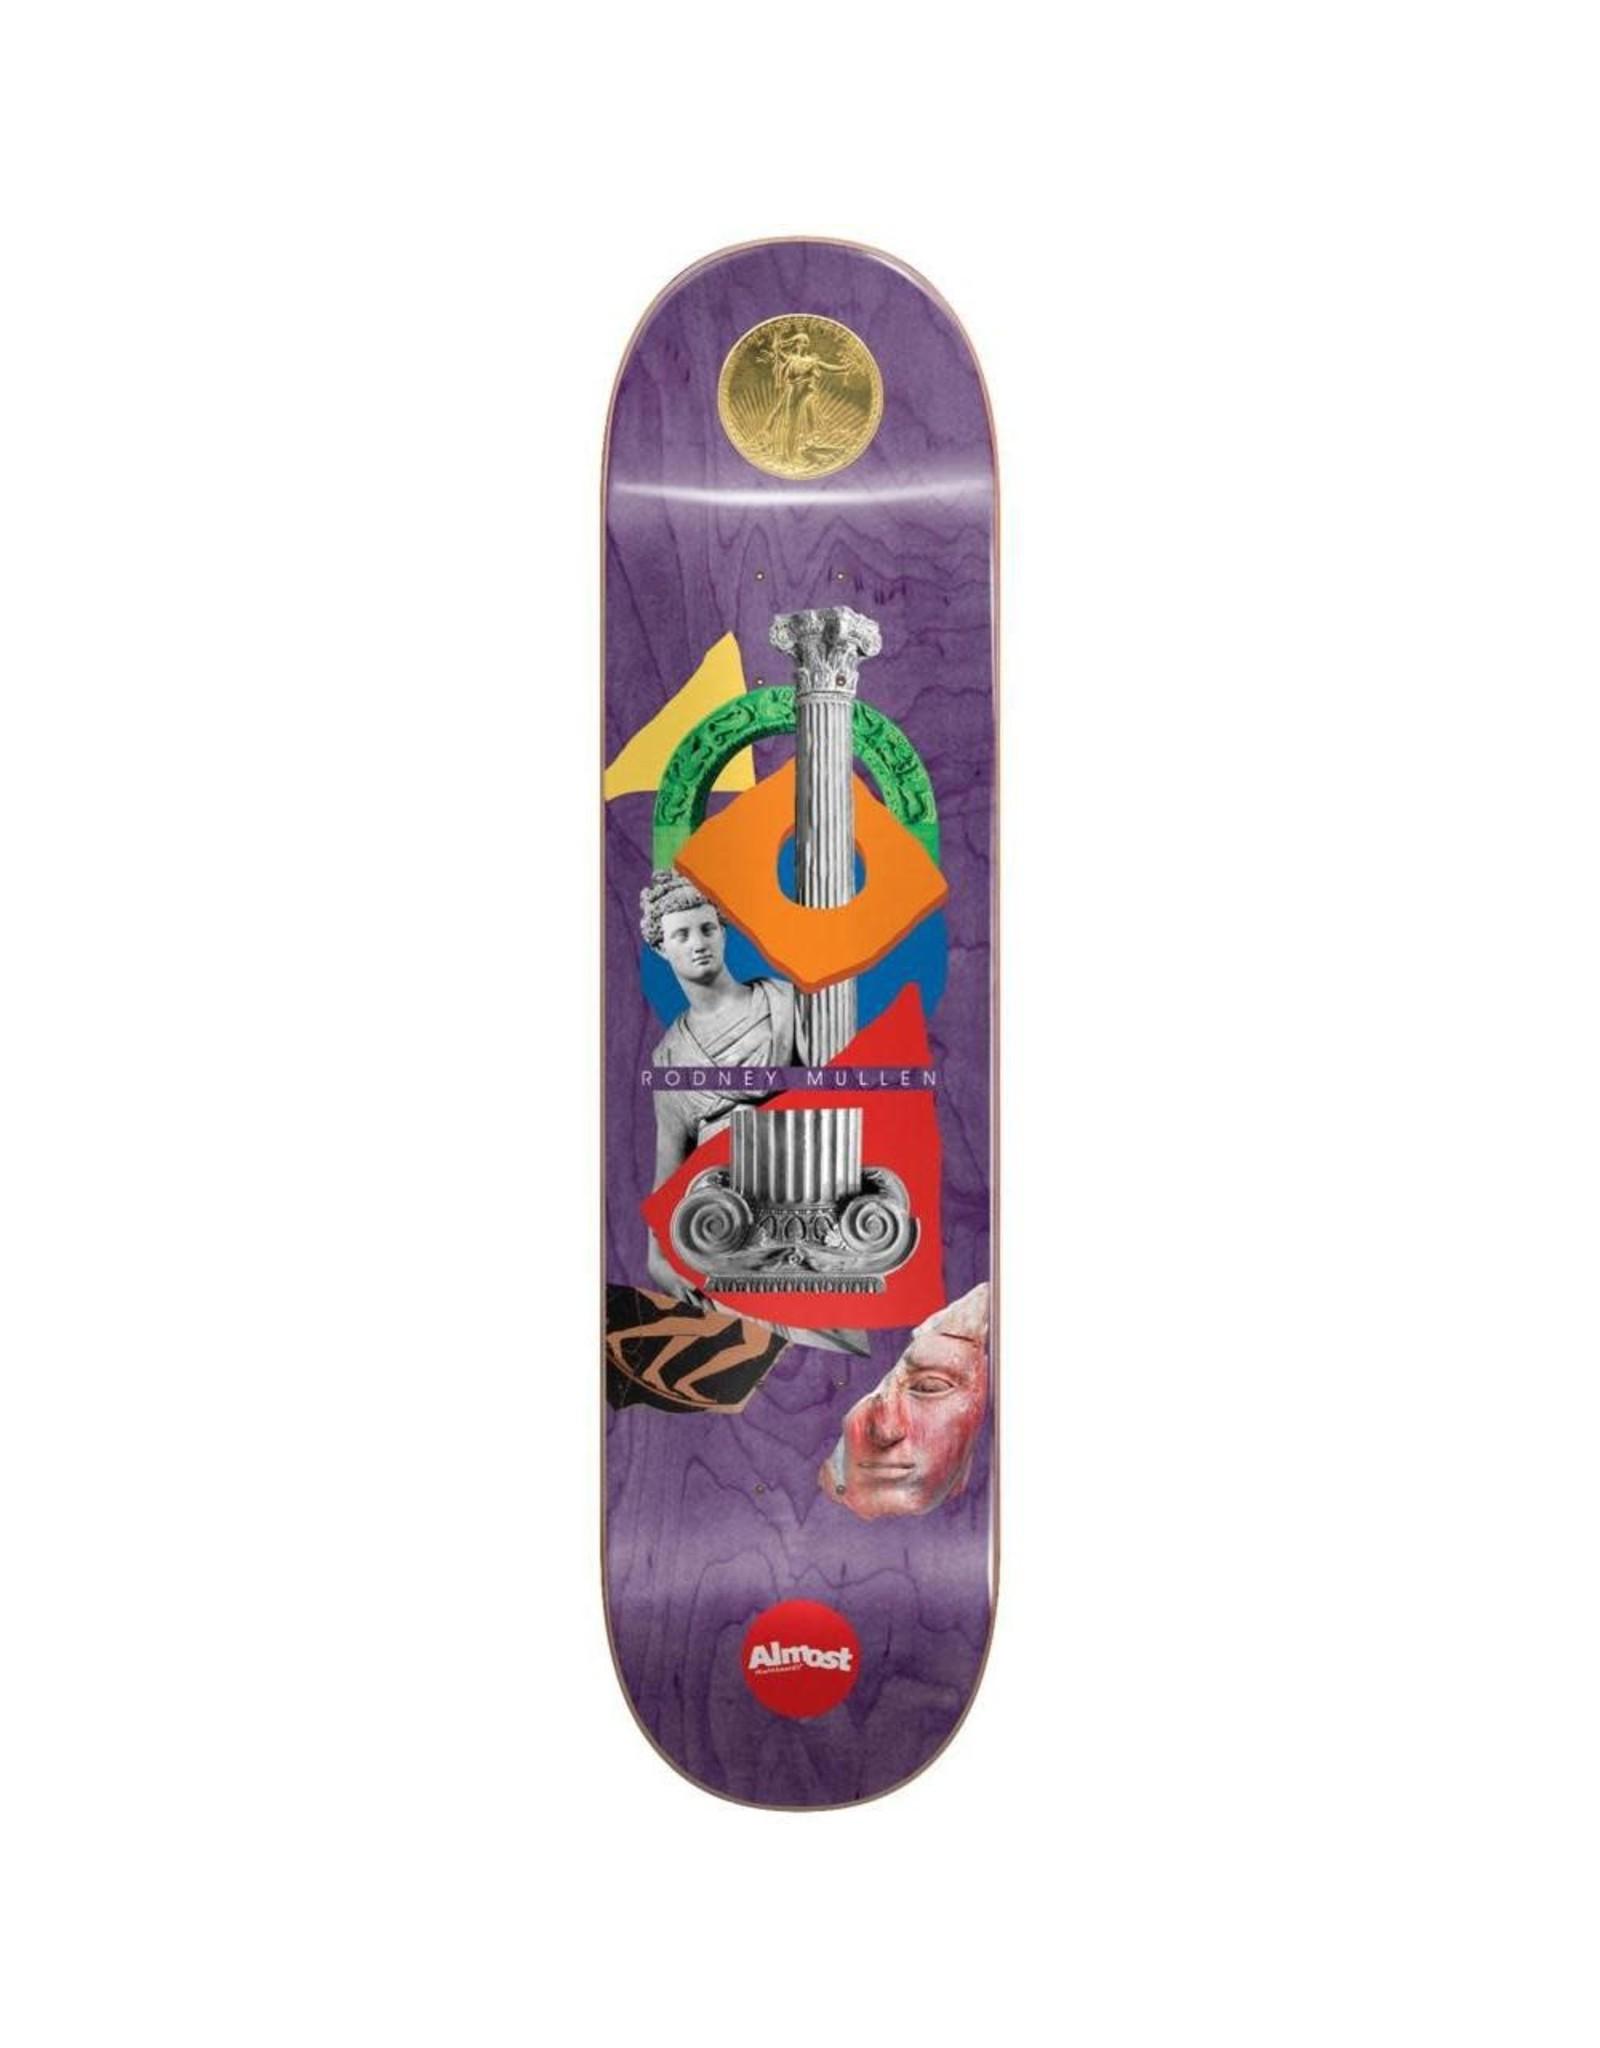 "Almost Skateboards Mullen Relics R7 (8.25"")"